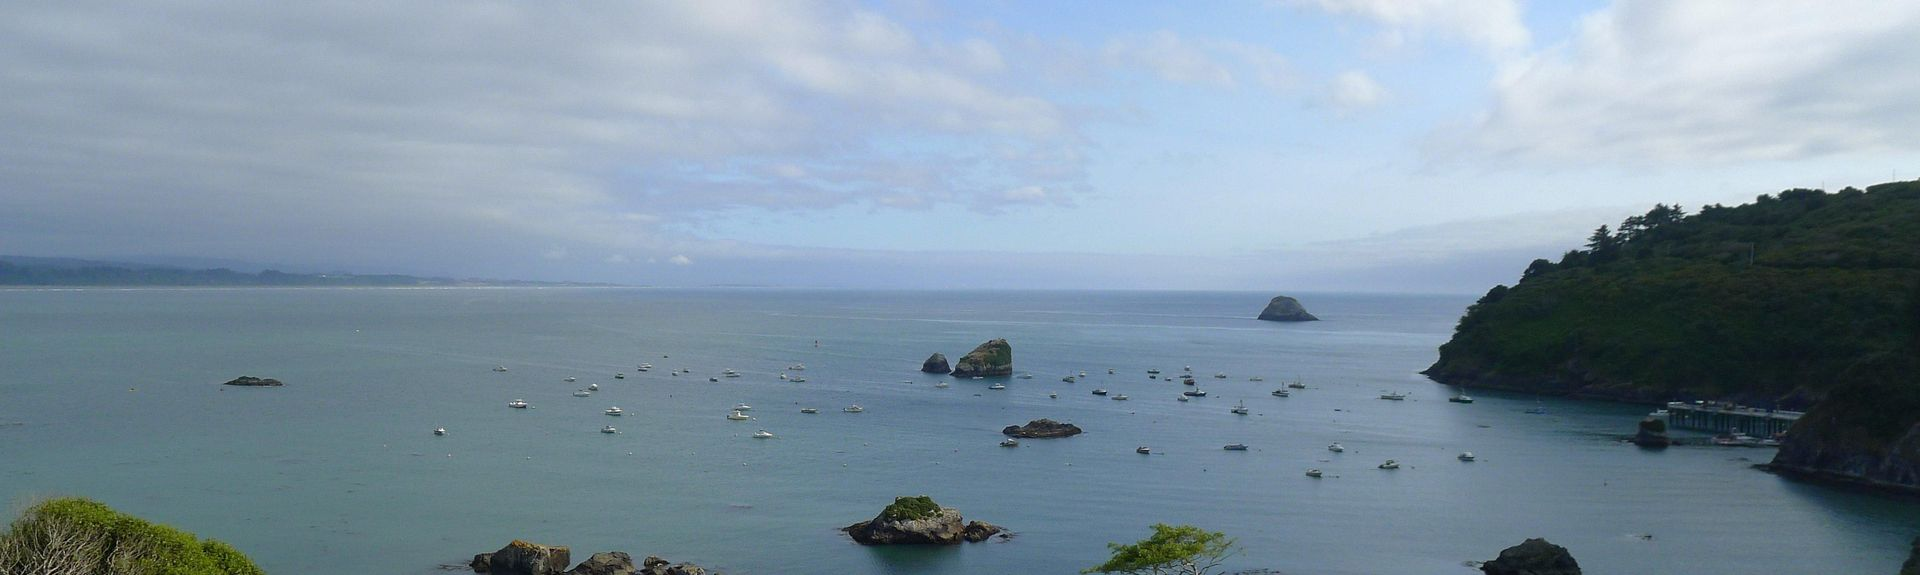 Trinidad Bay, Trinidad, California, United States